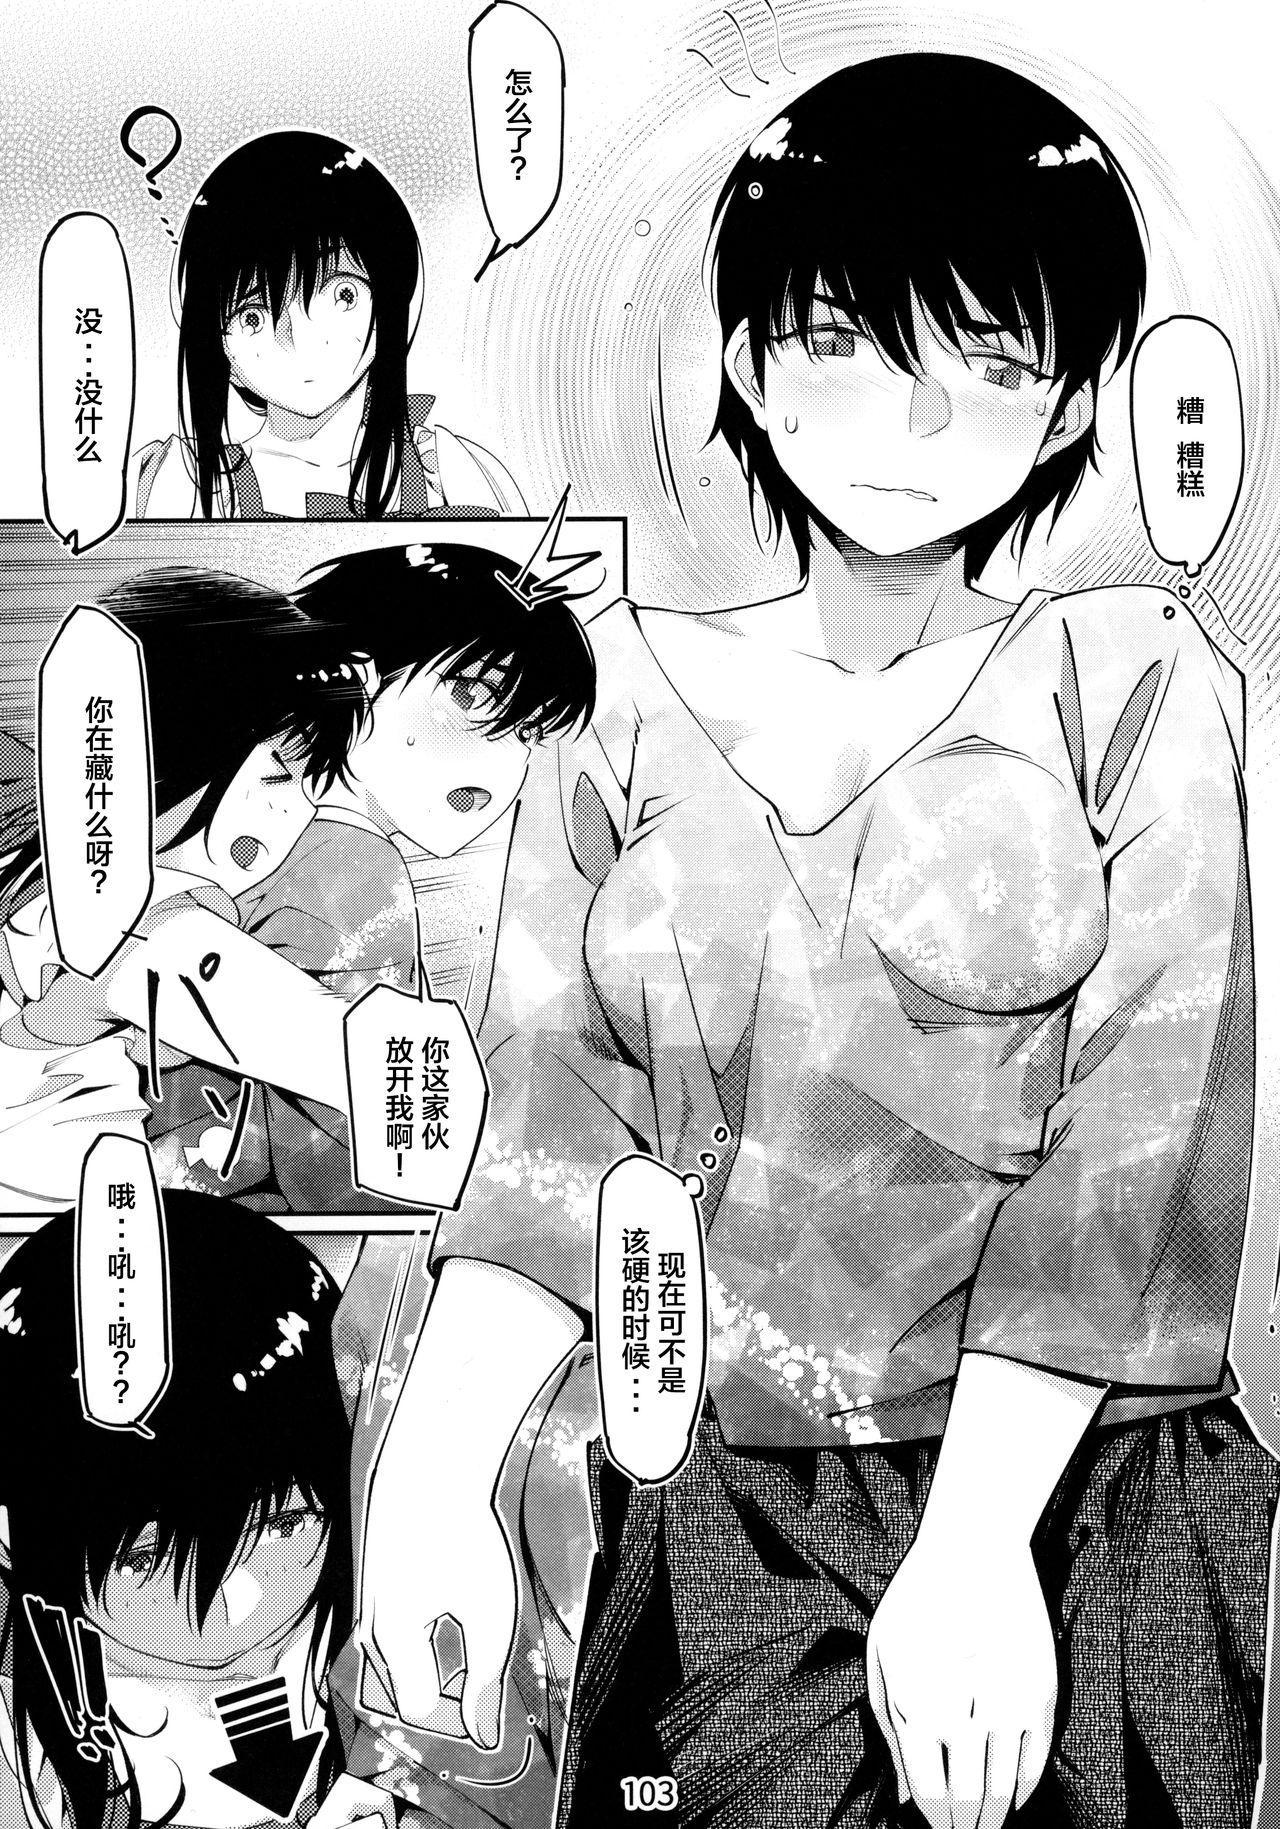 Otonano Omochiya 6 Kan 102